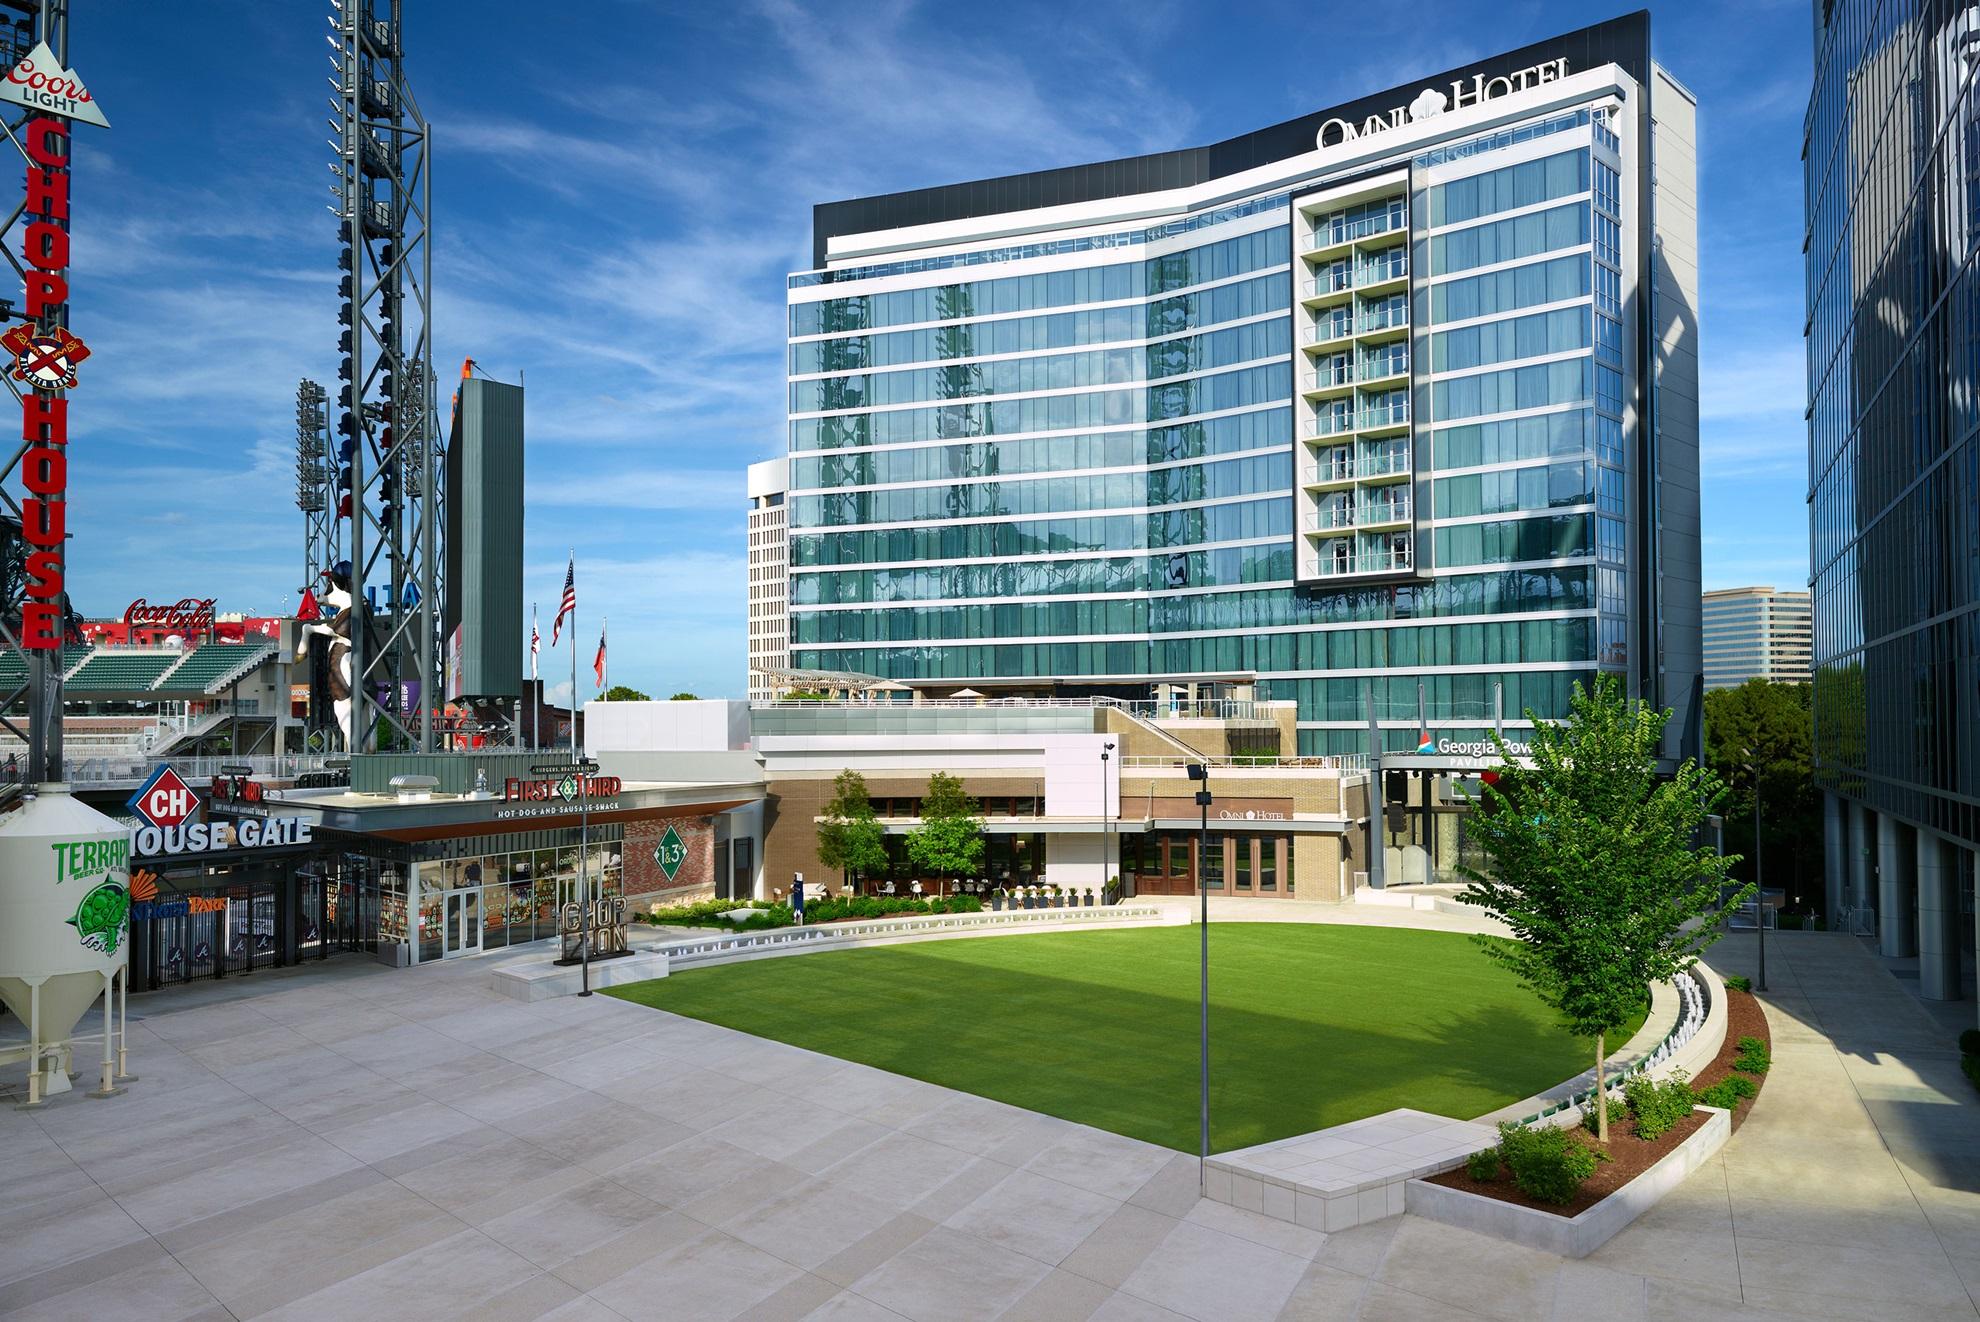 Atlanta Casino